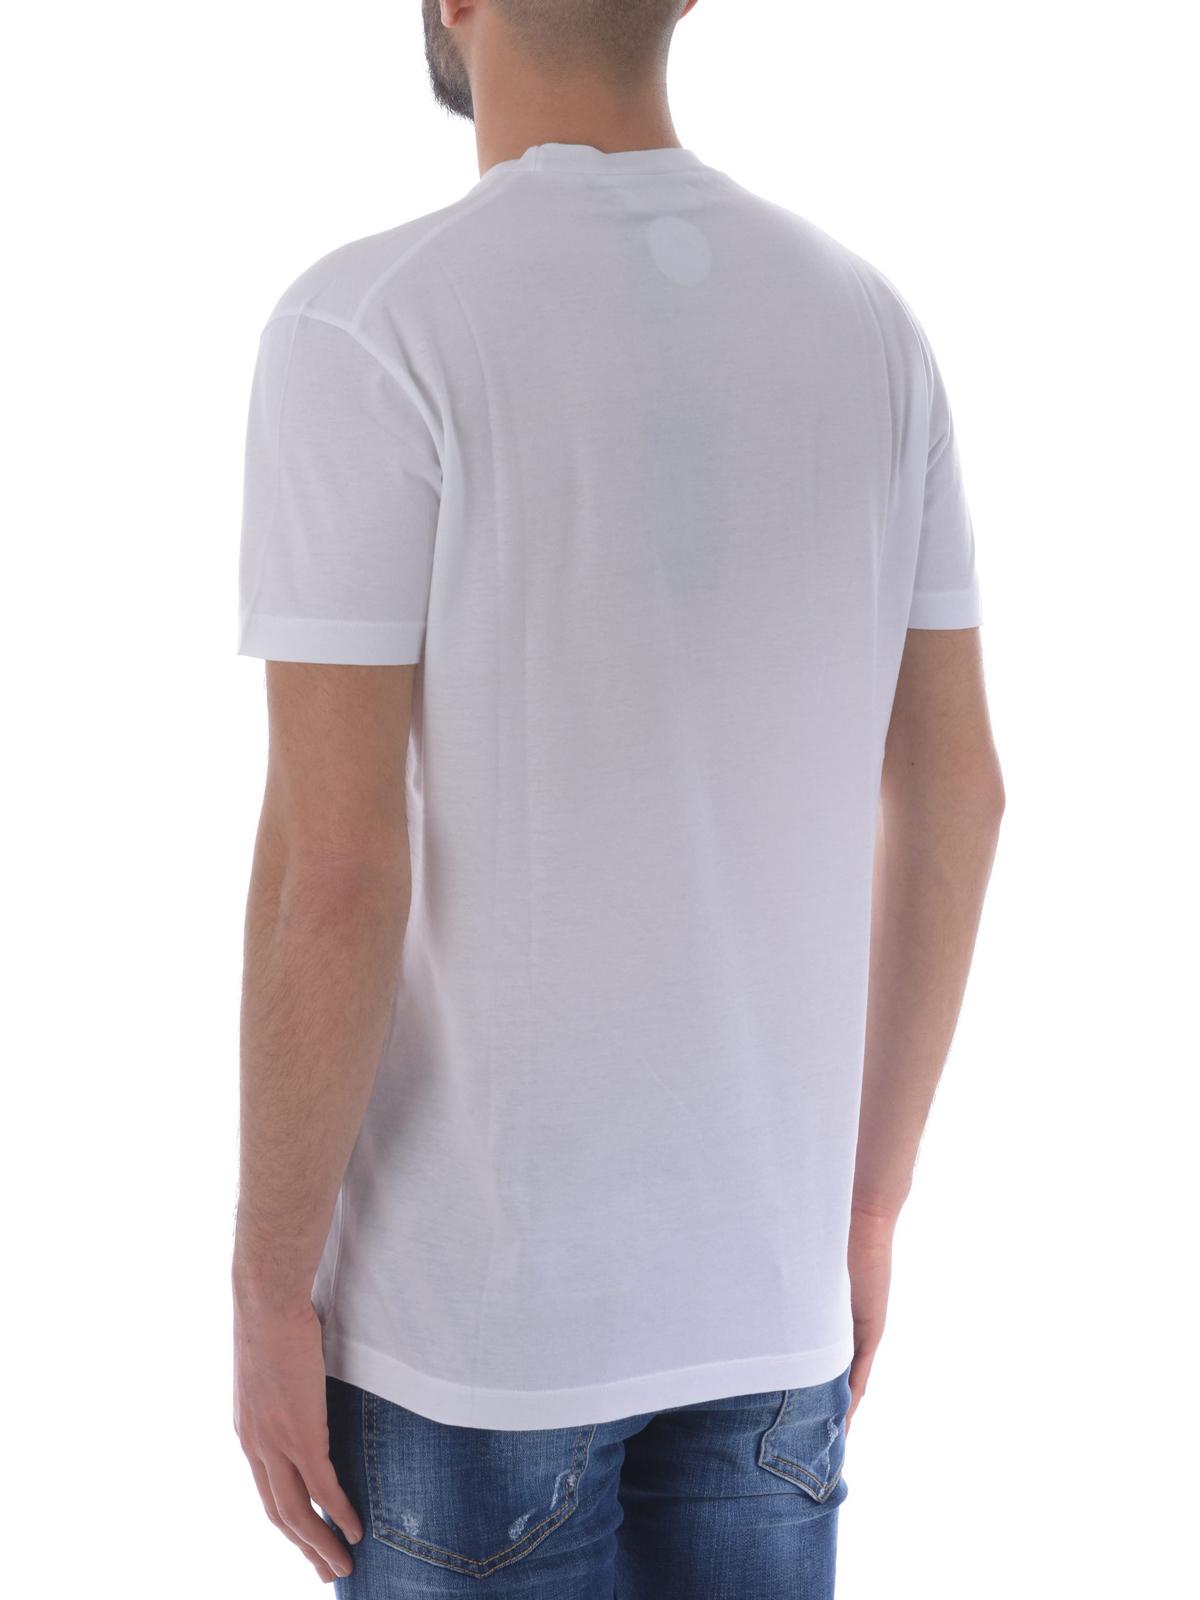 60e120ea9b6a5 Dsquared2 - Savage print T-shirt - t-shirts - S71GD0627S22427100